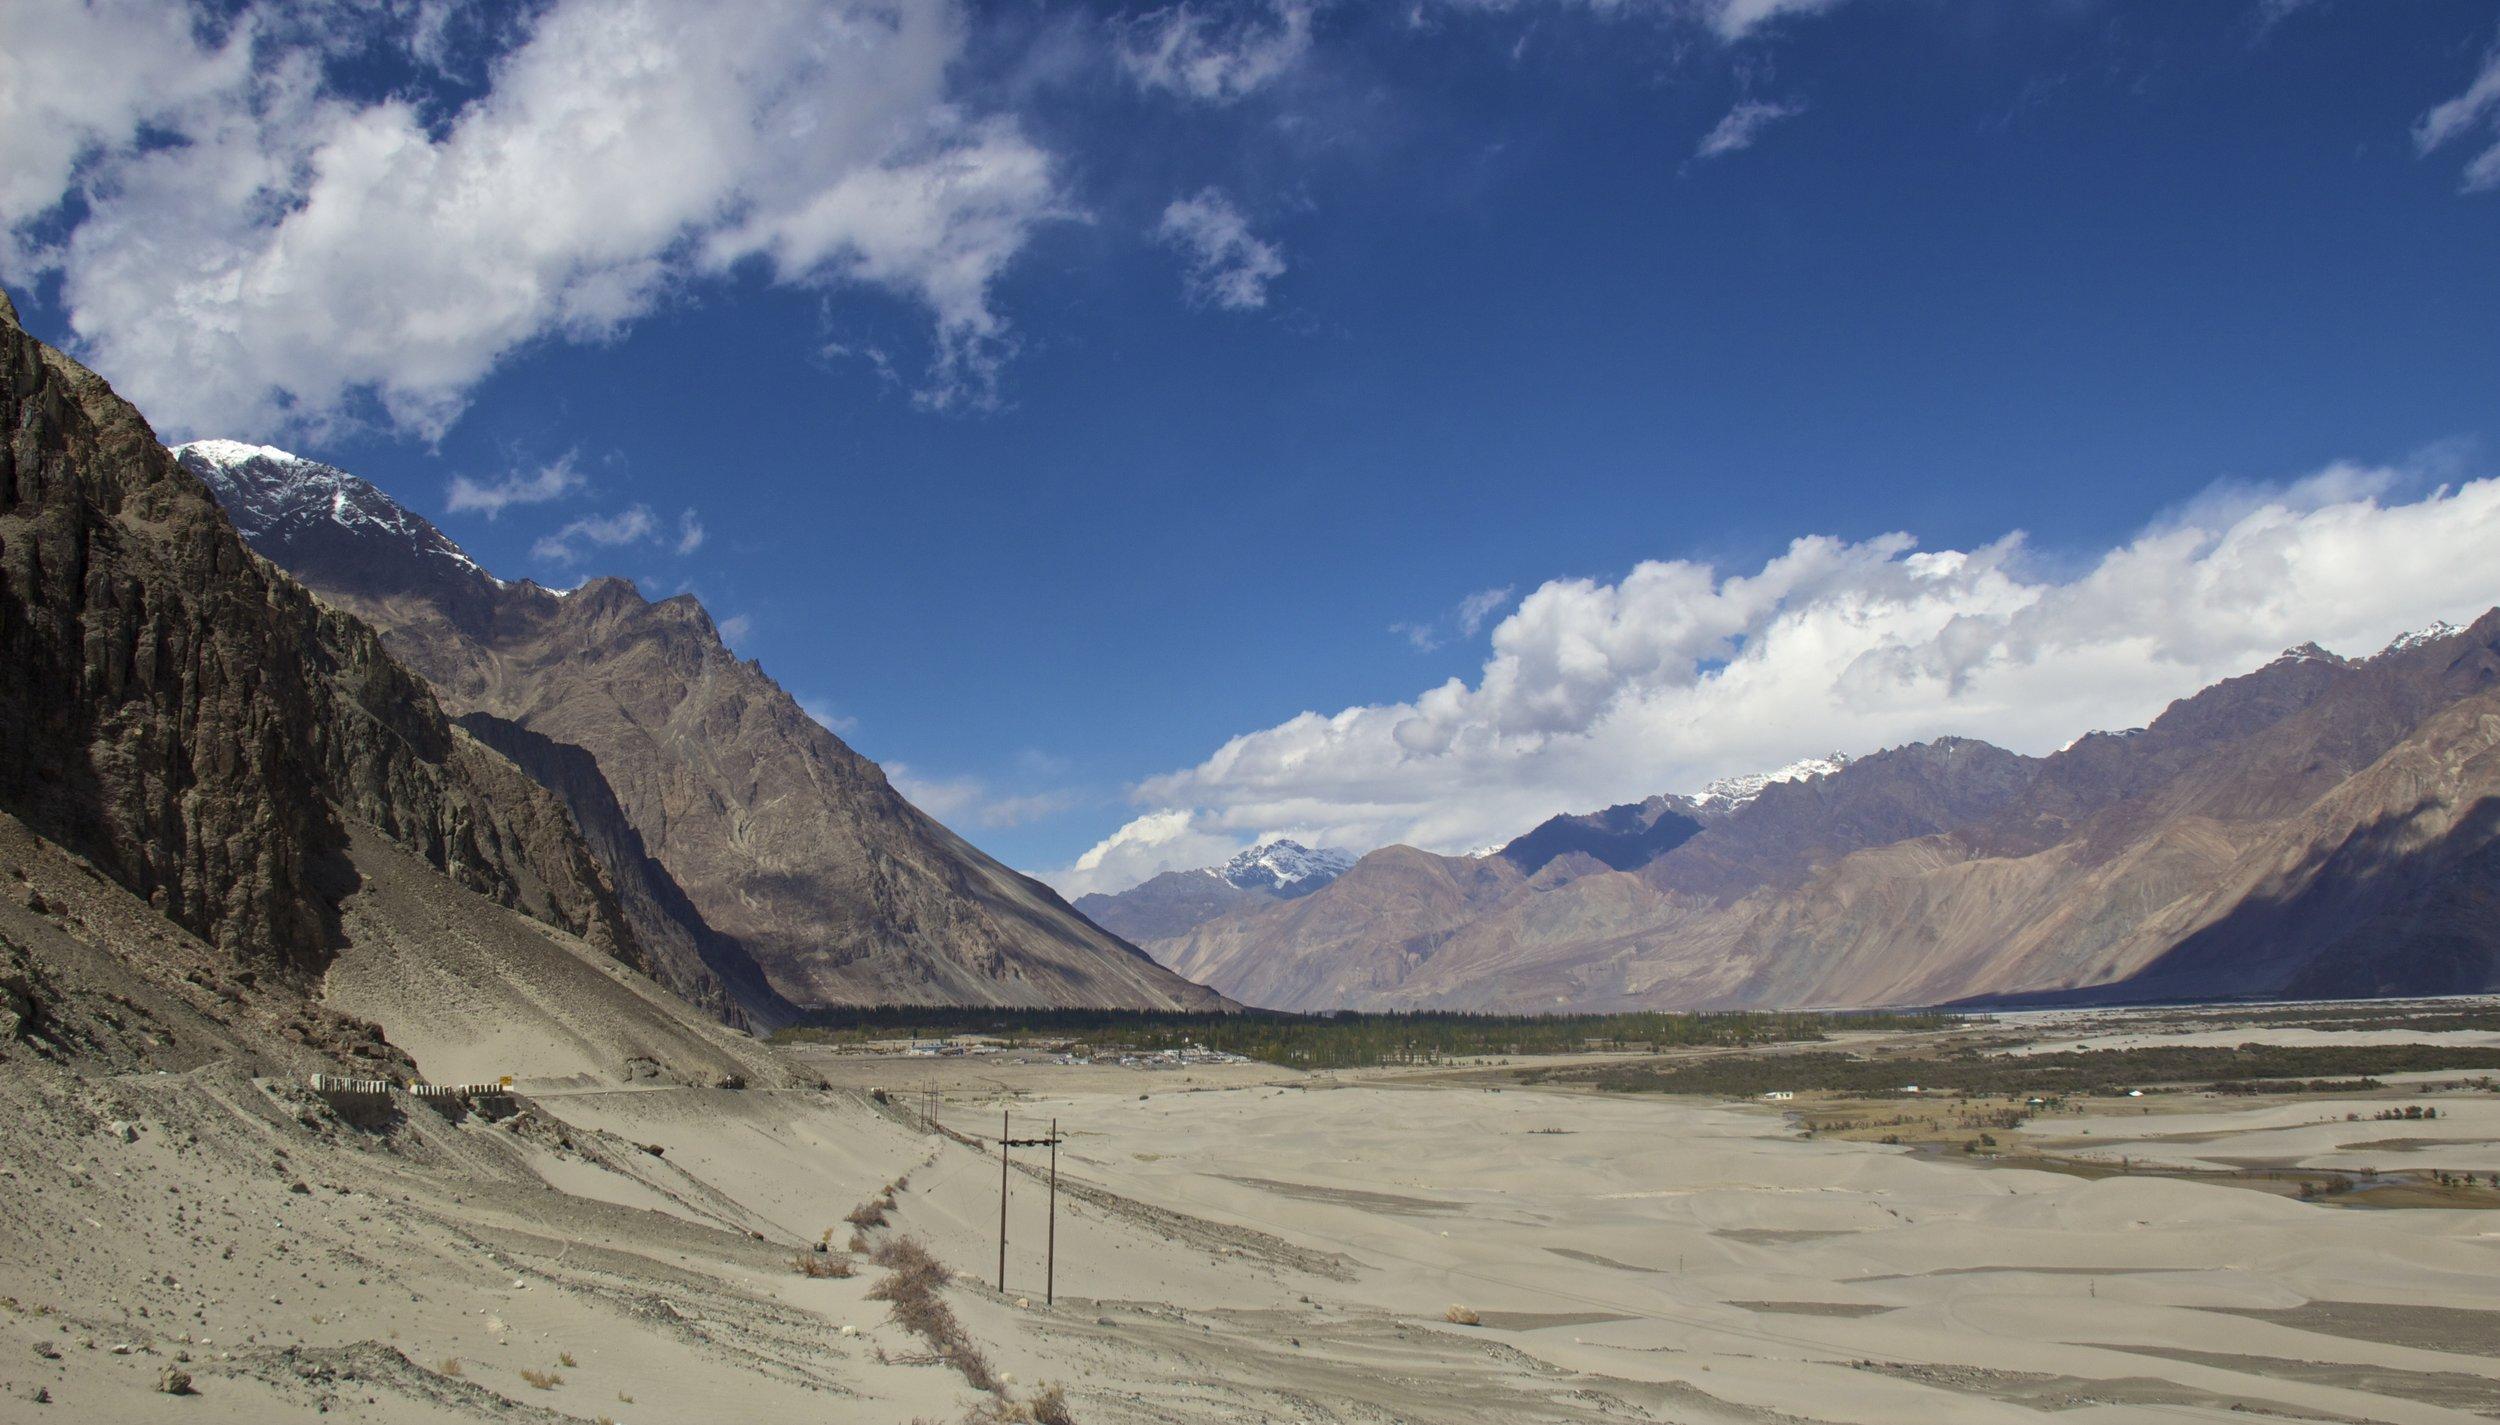 Nubra Valley Ladakh Kashmir Indian Himalayas Roads 9.jpg